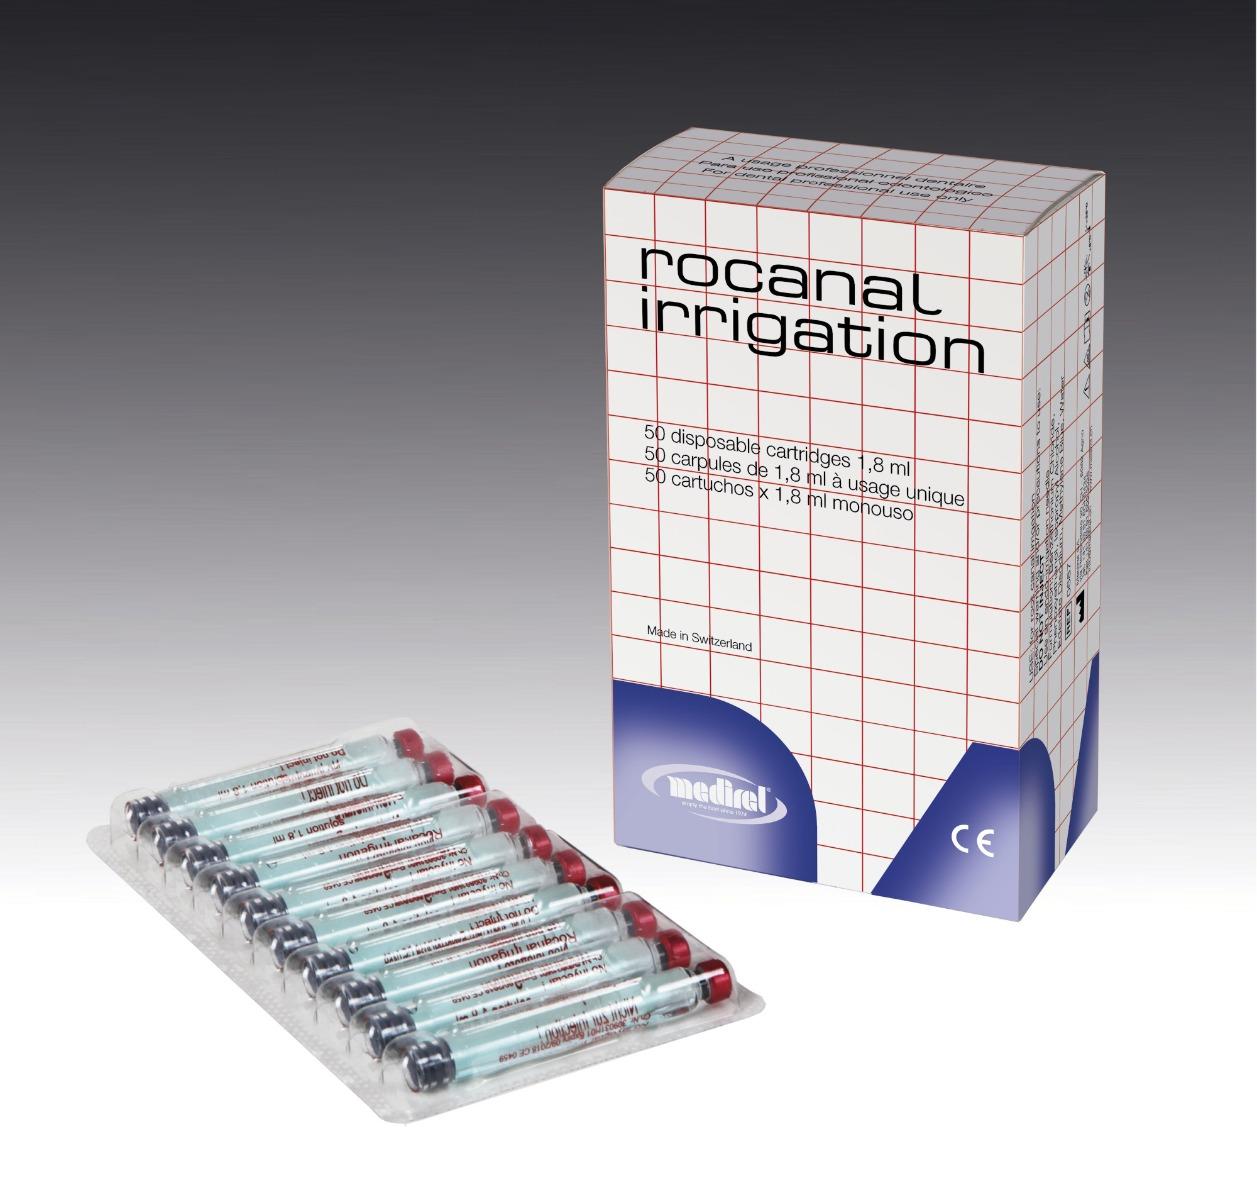 Rocanal Irrigation (50 capsule x 1.8ml)